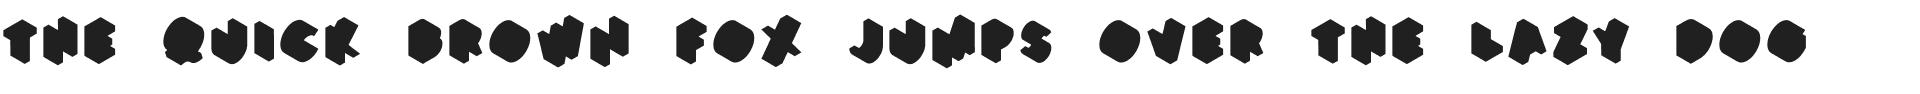 Anaglyph Isometric